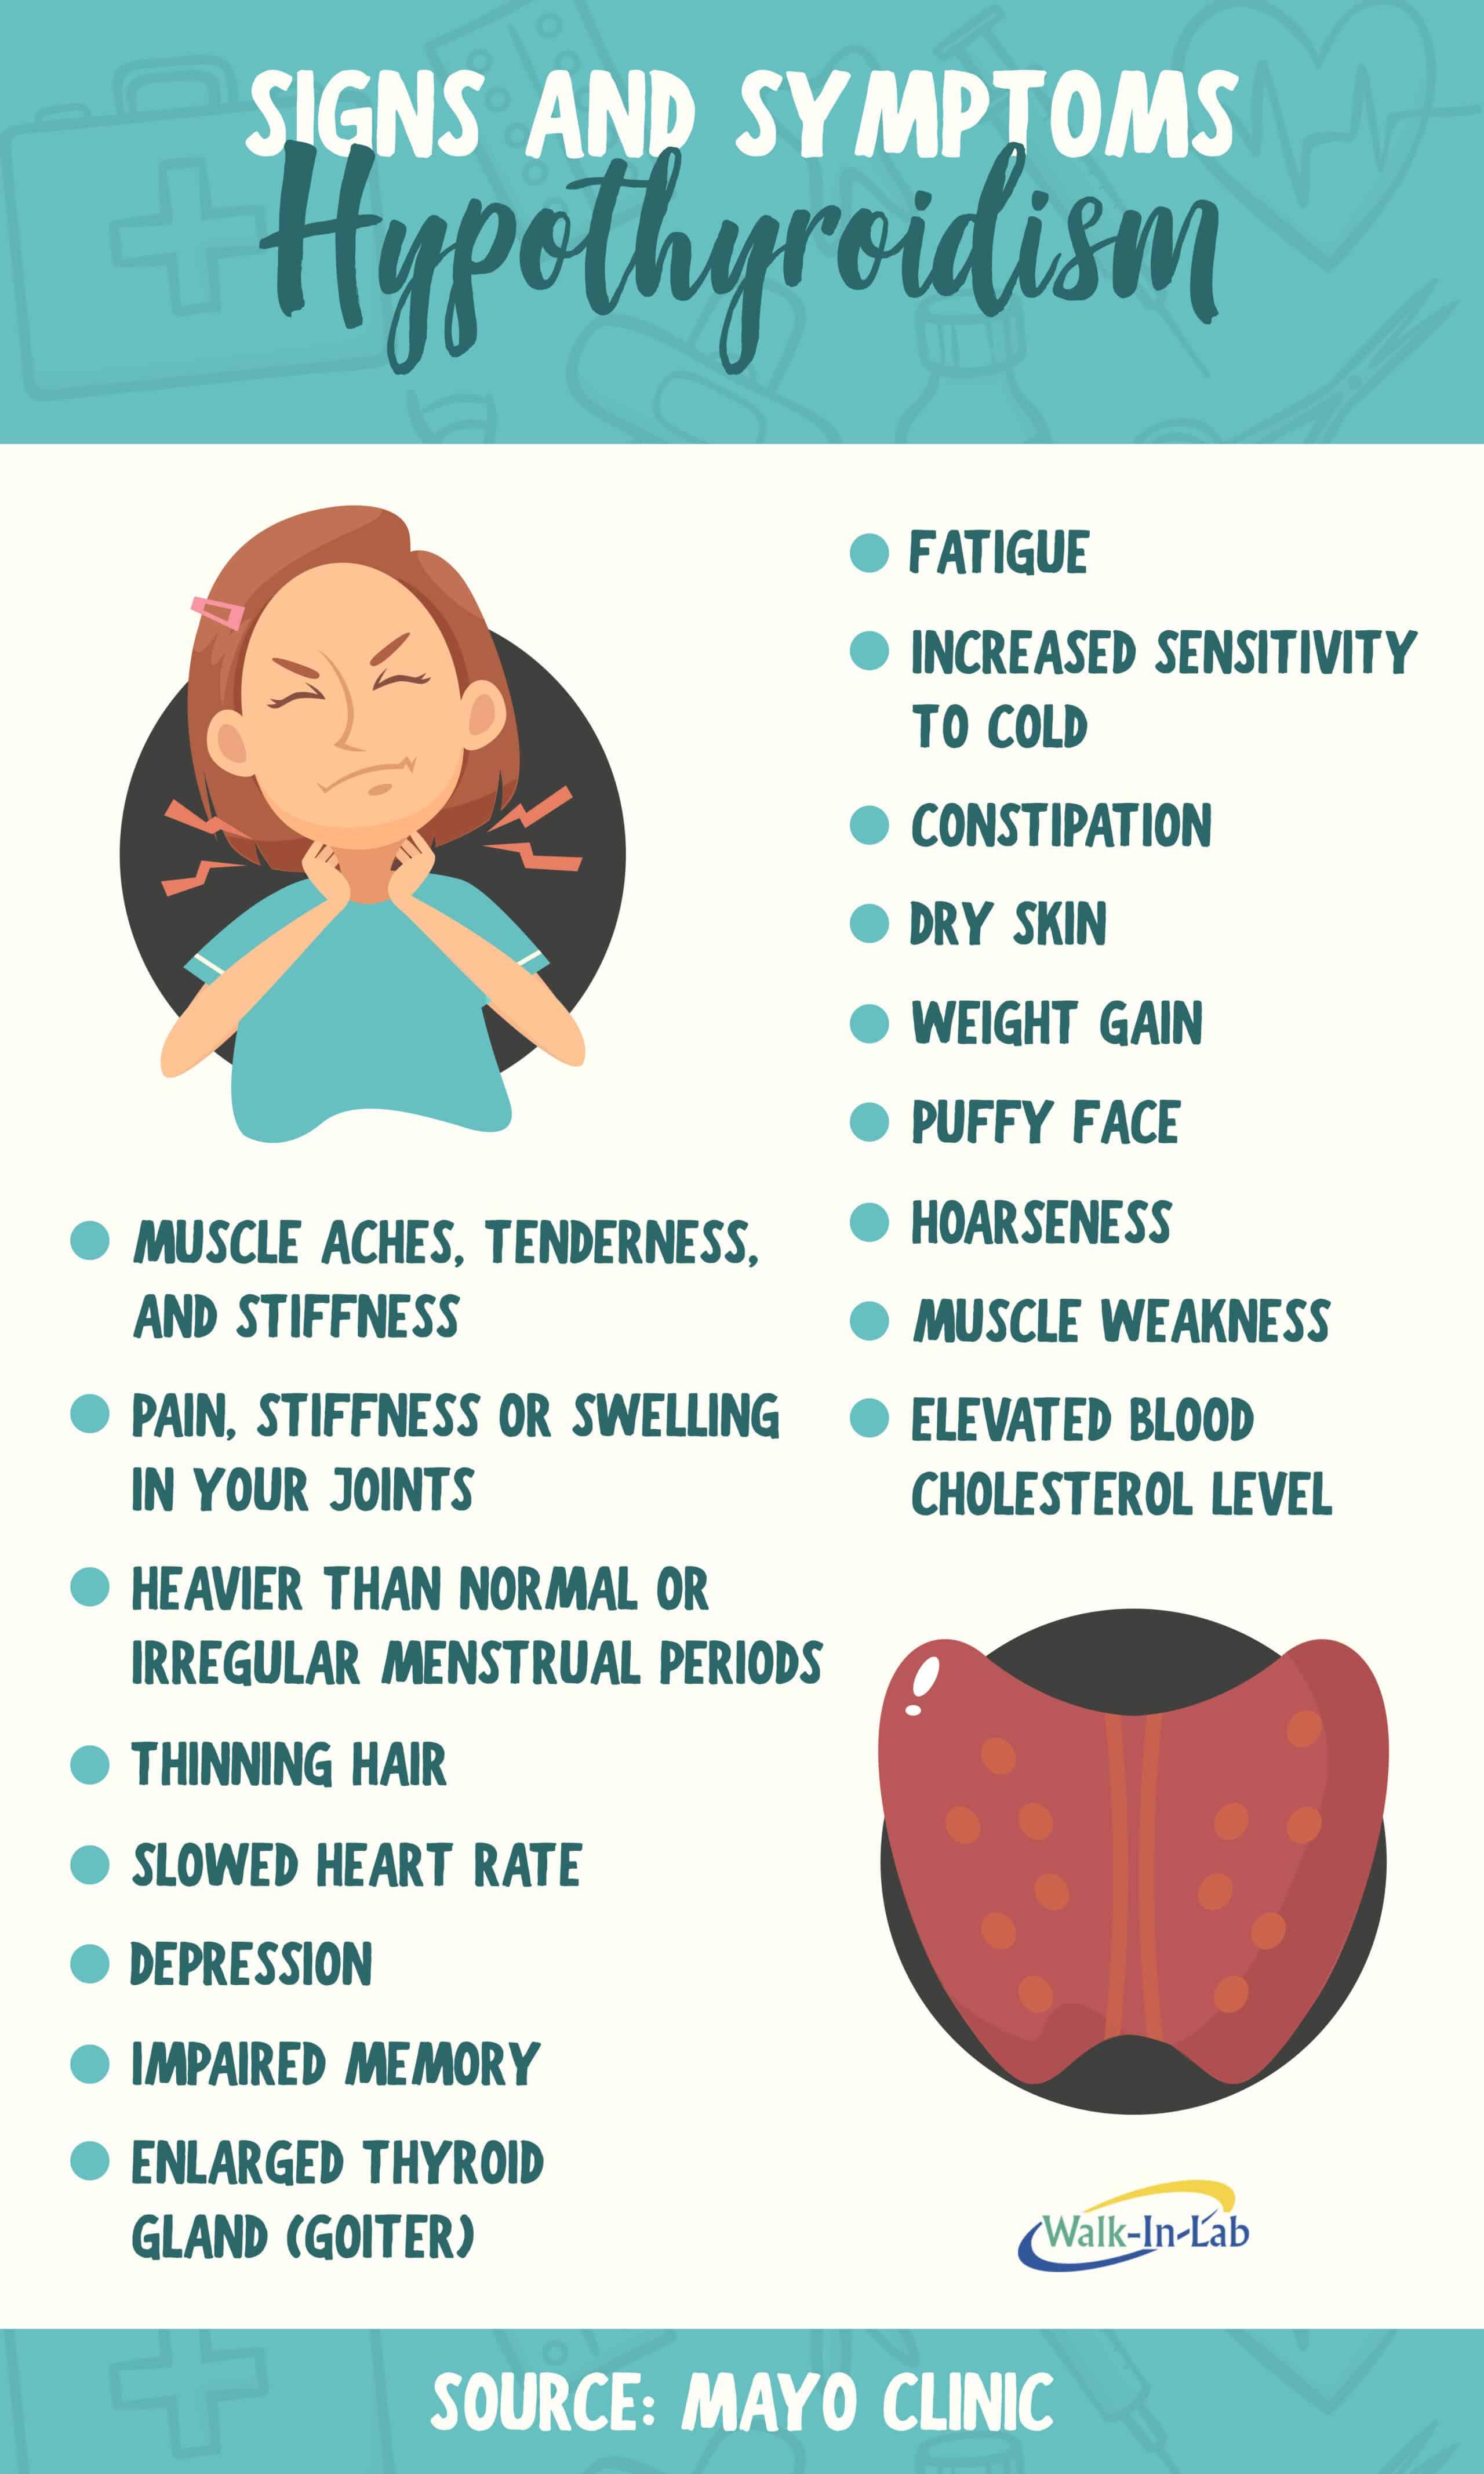 Signs of Hypothyroidism & Hyperthyroidism